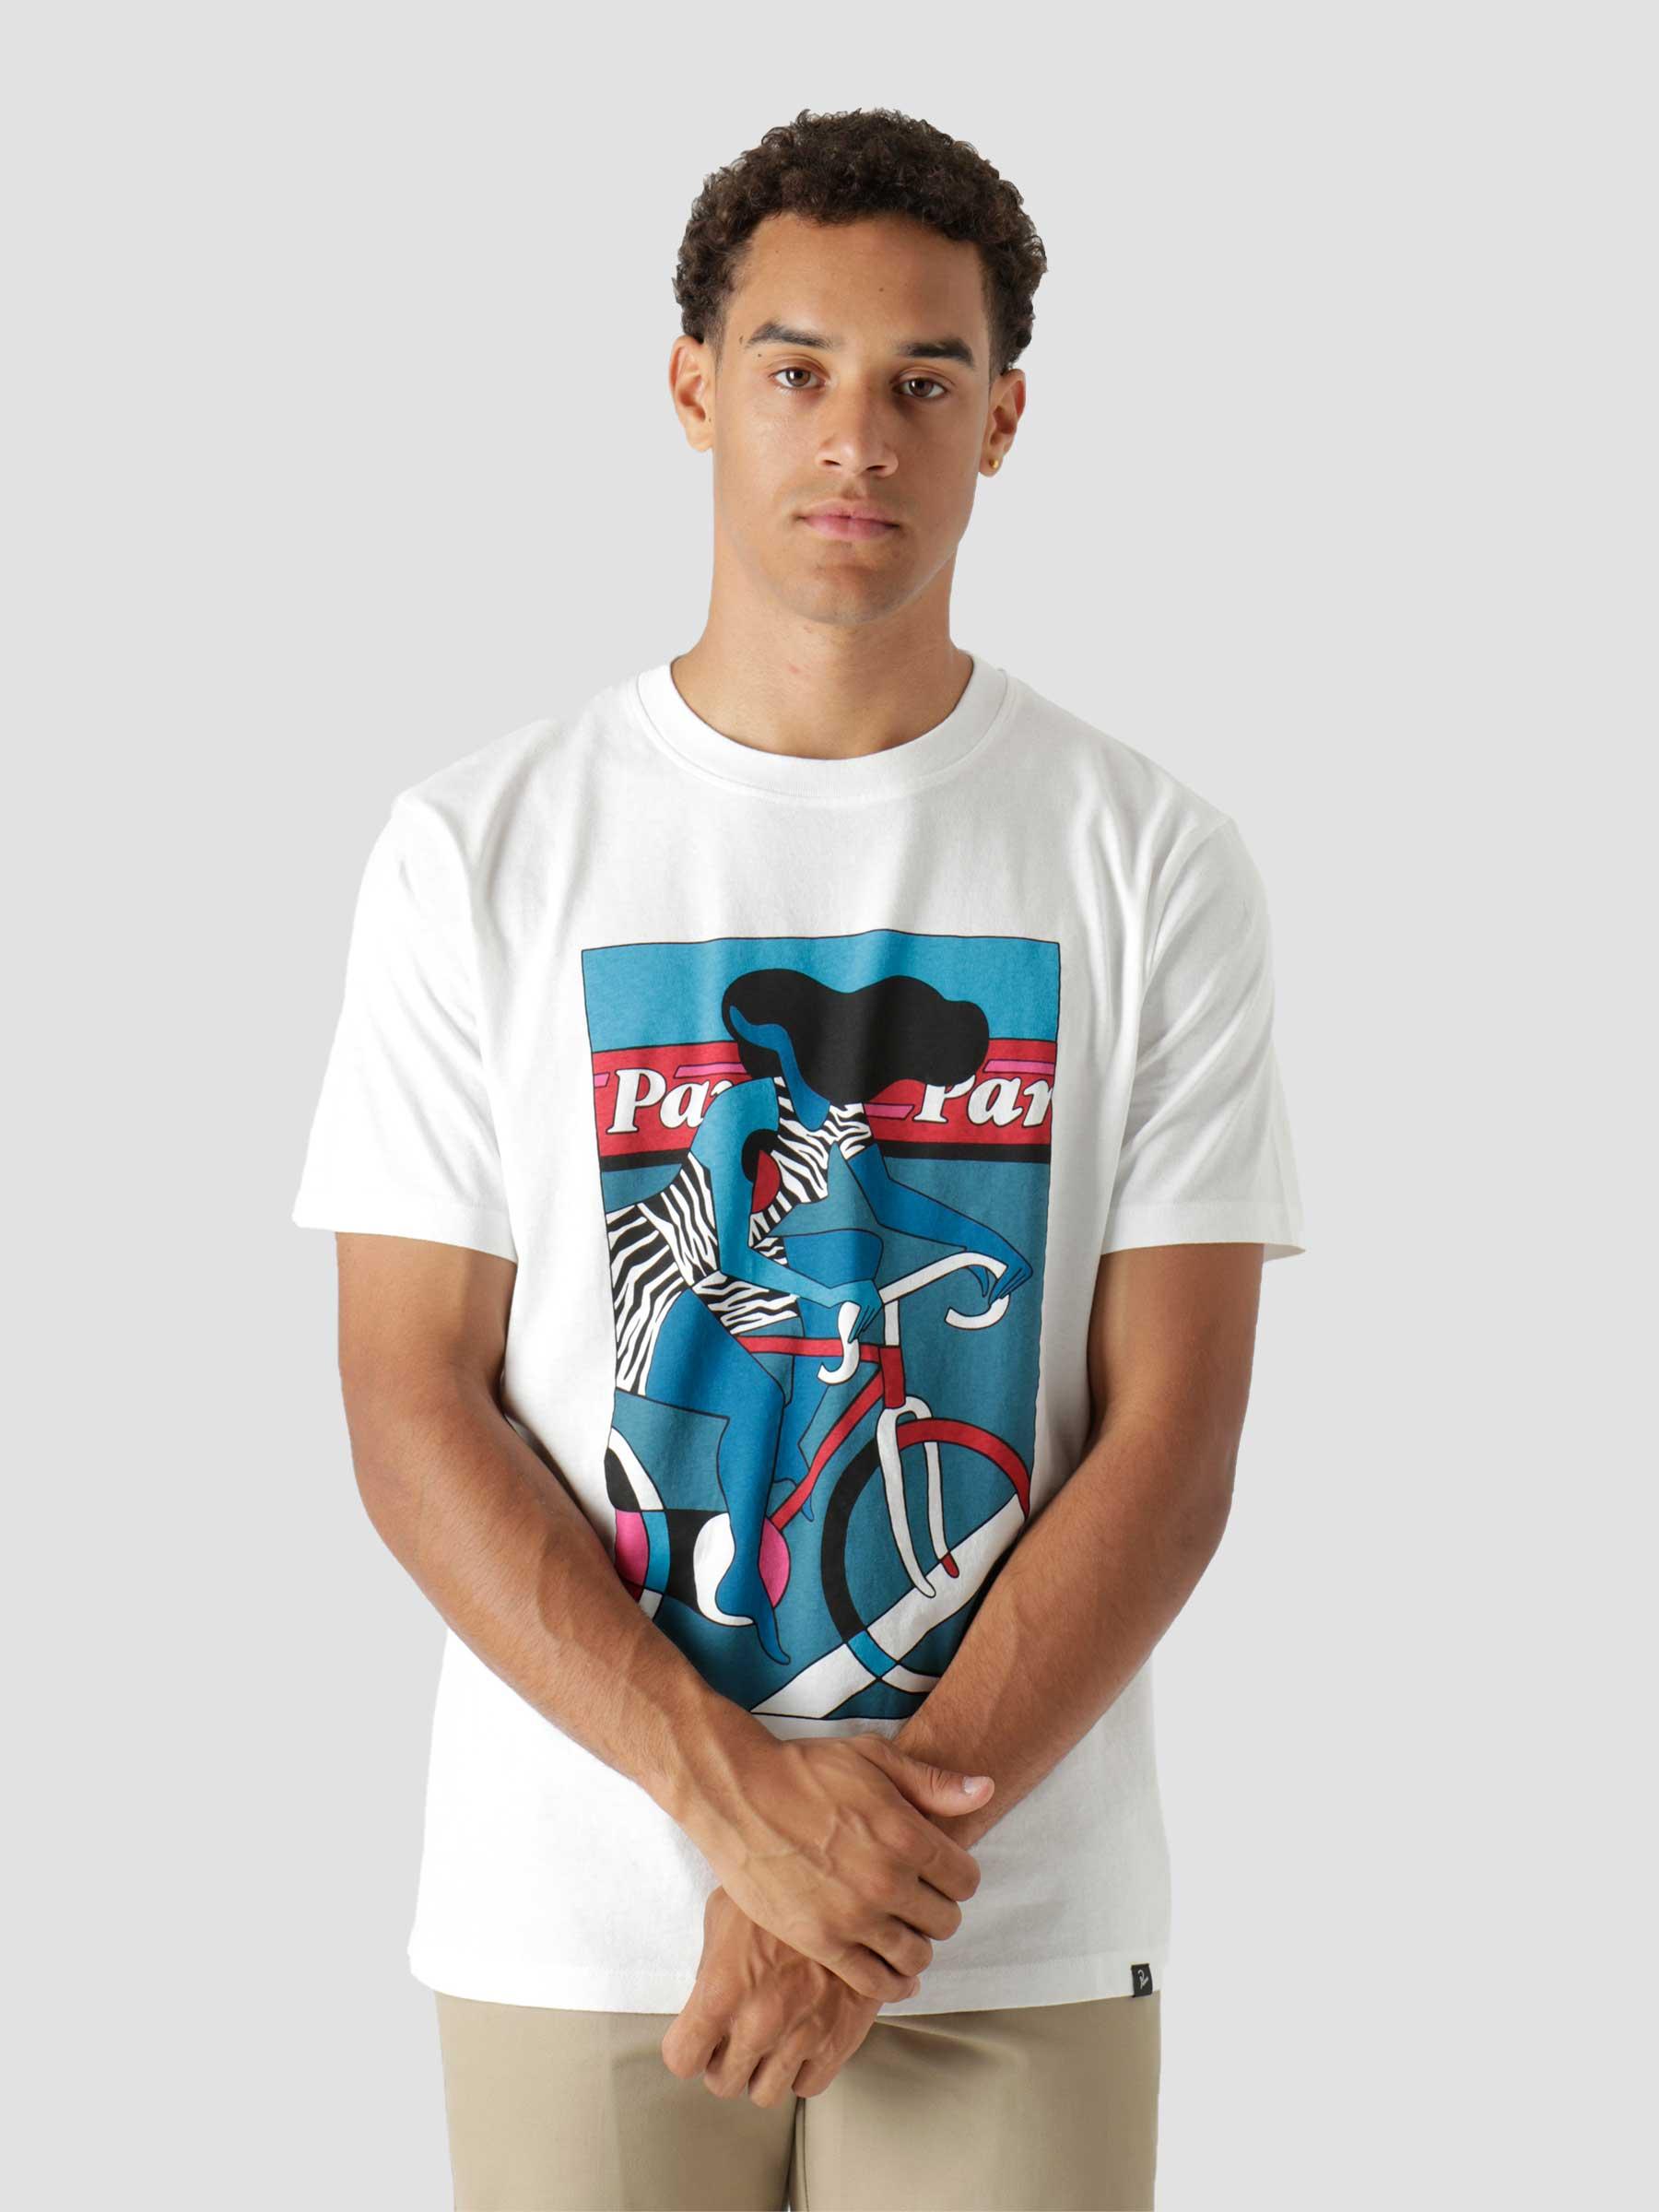 Photo Finish T-Shirt White 46200